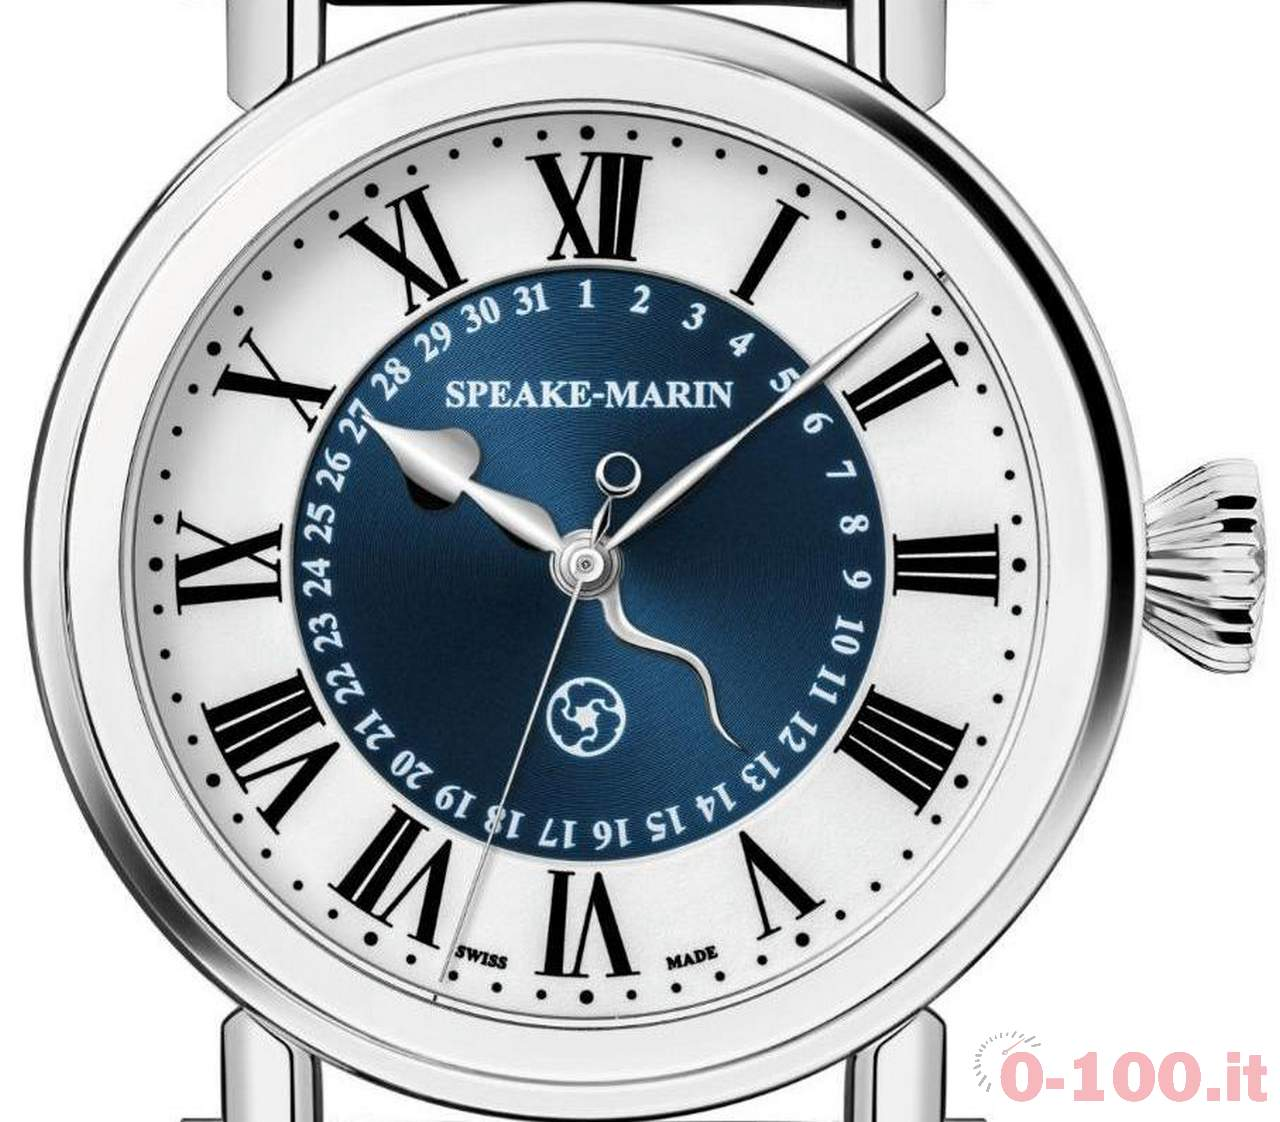 anteprima-baselworld-2016-speake-marin-serpent-calendar-prezzo-price_0-1003